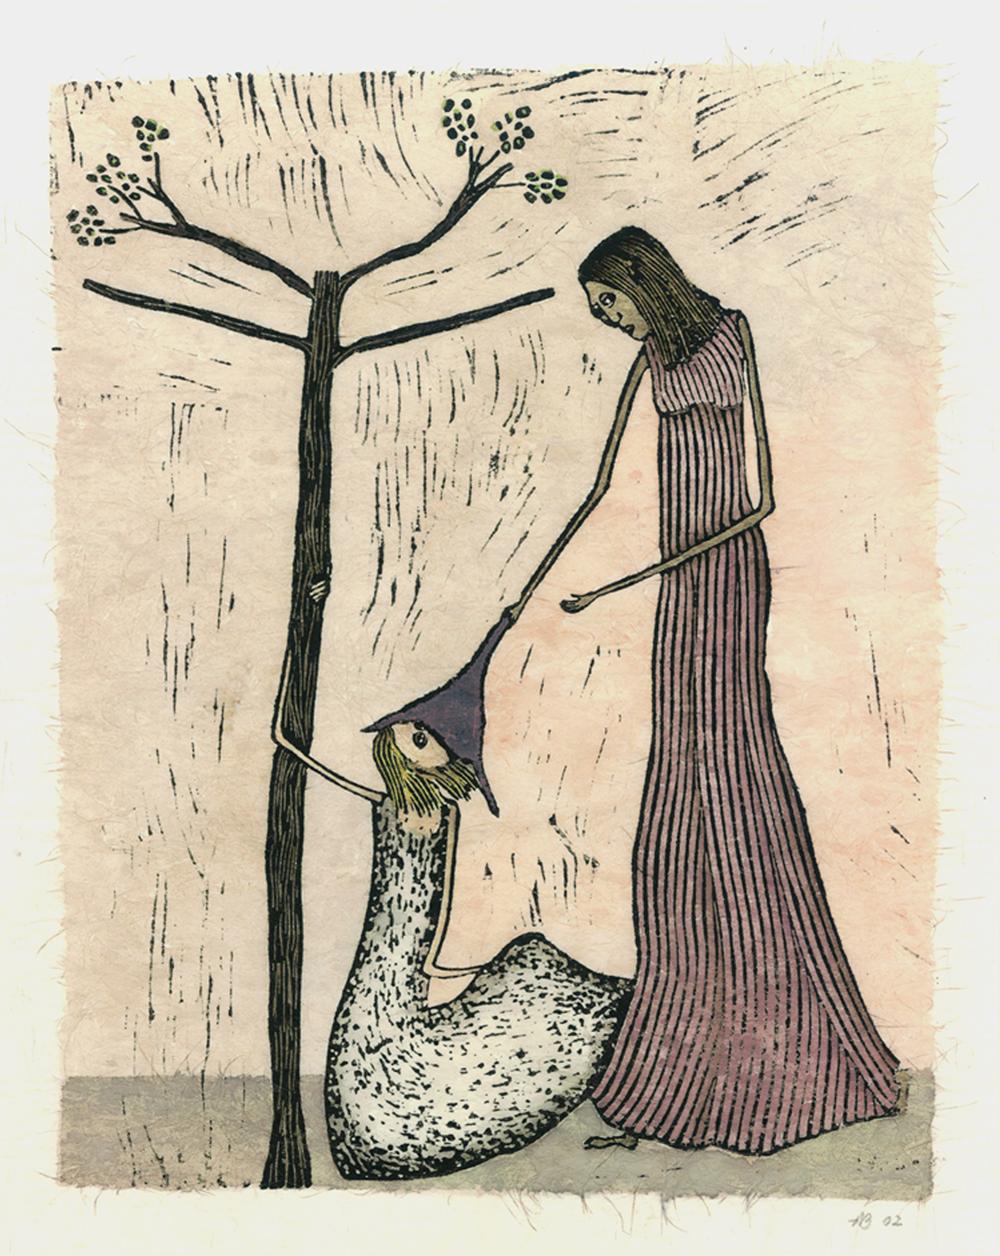 ...en de boom bloeit VI kruisweg, ingekleurde linosnede